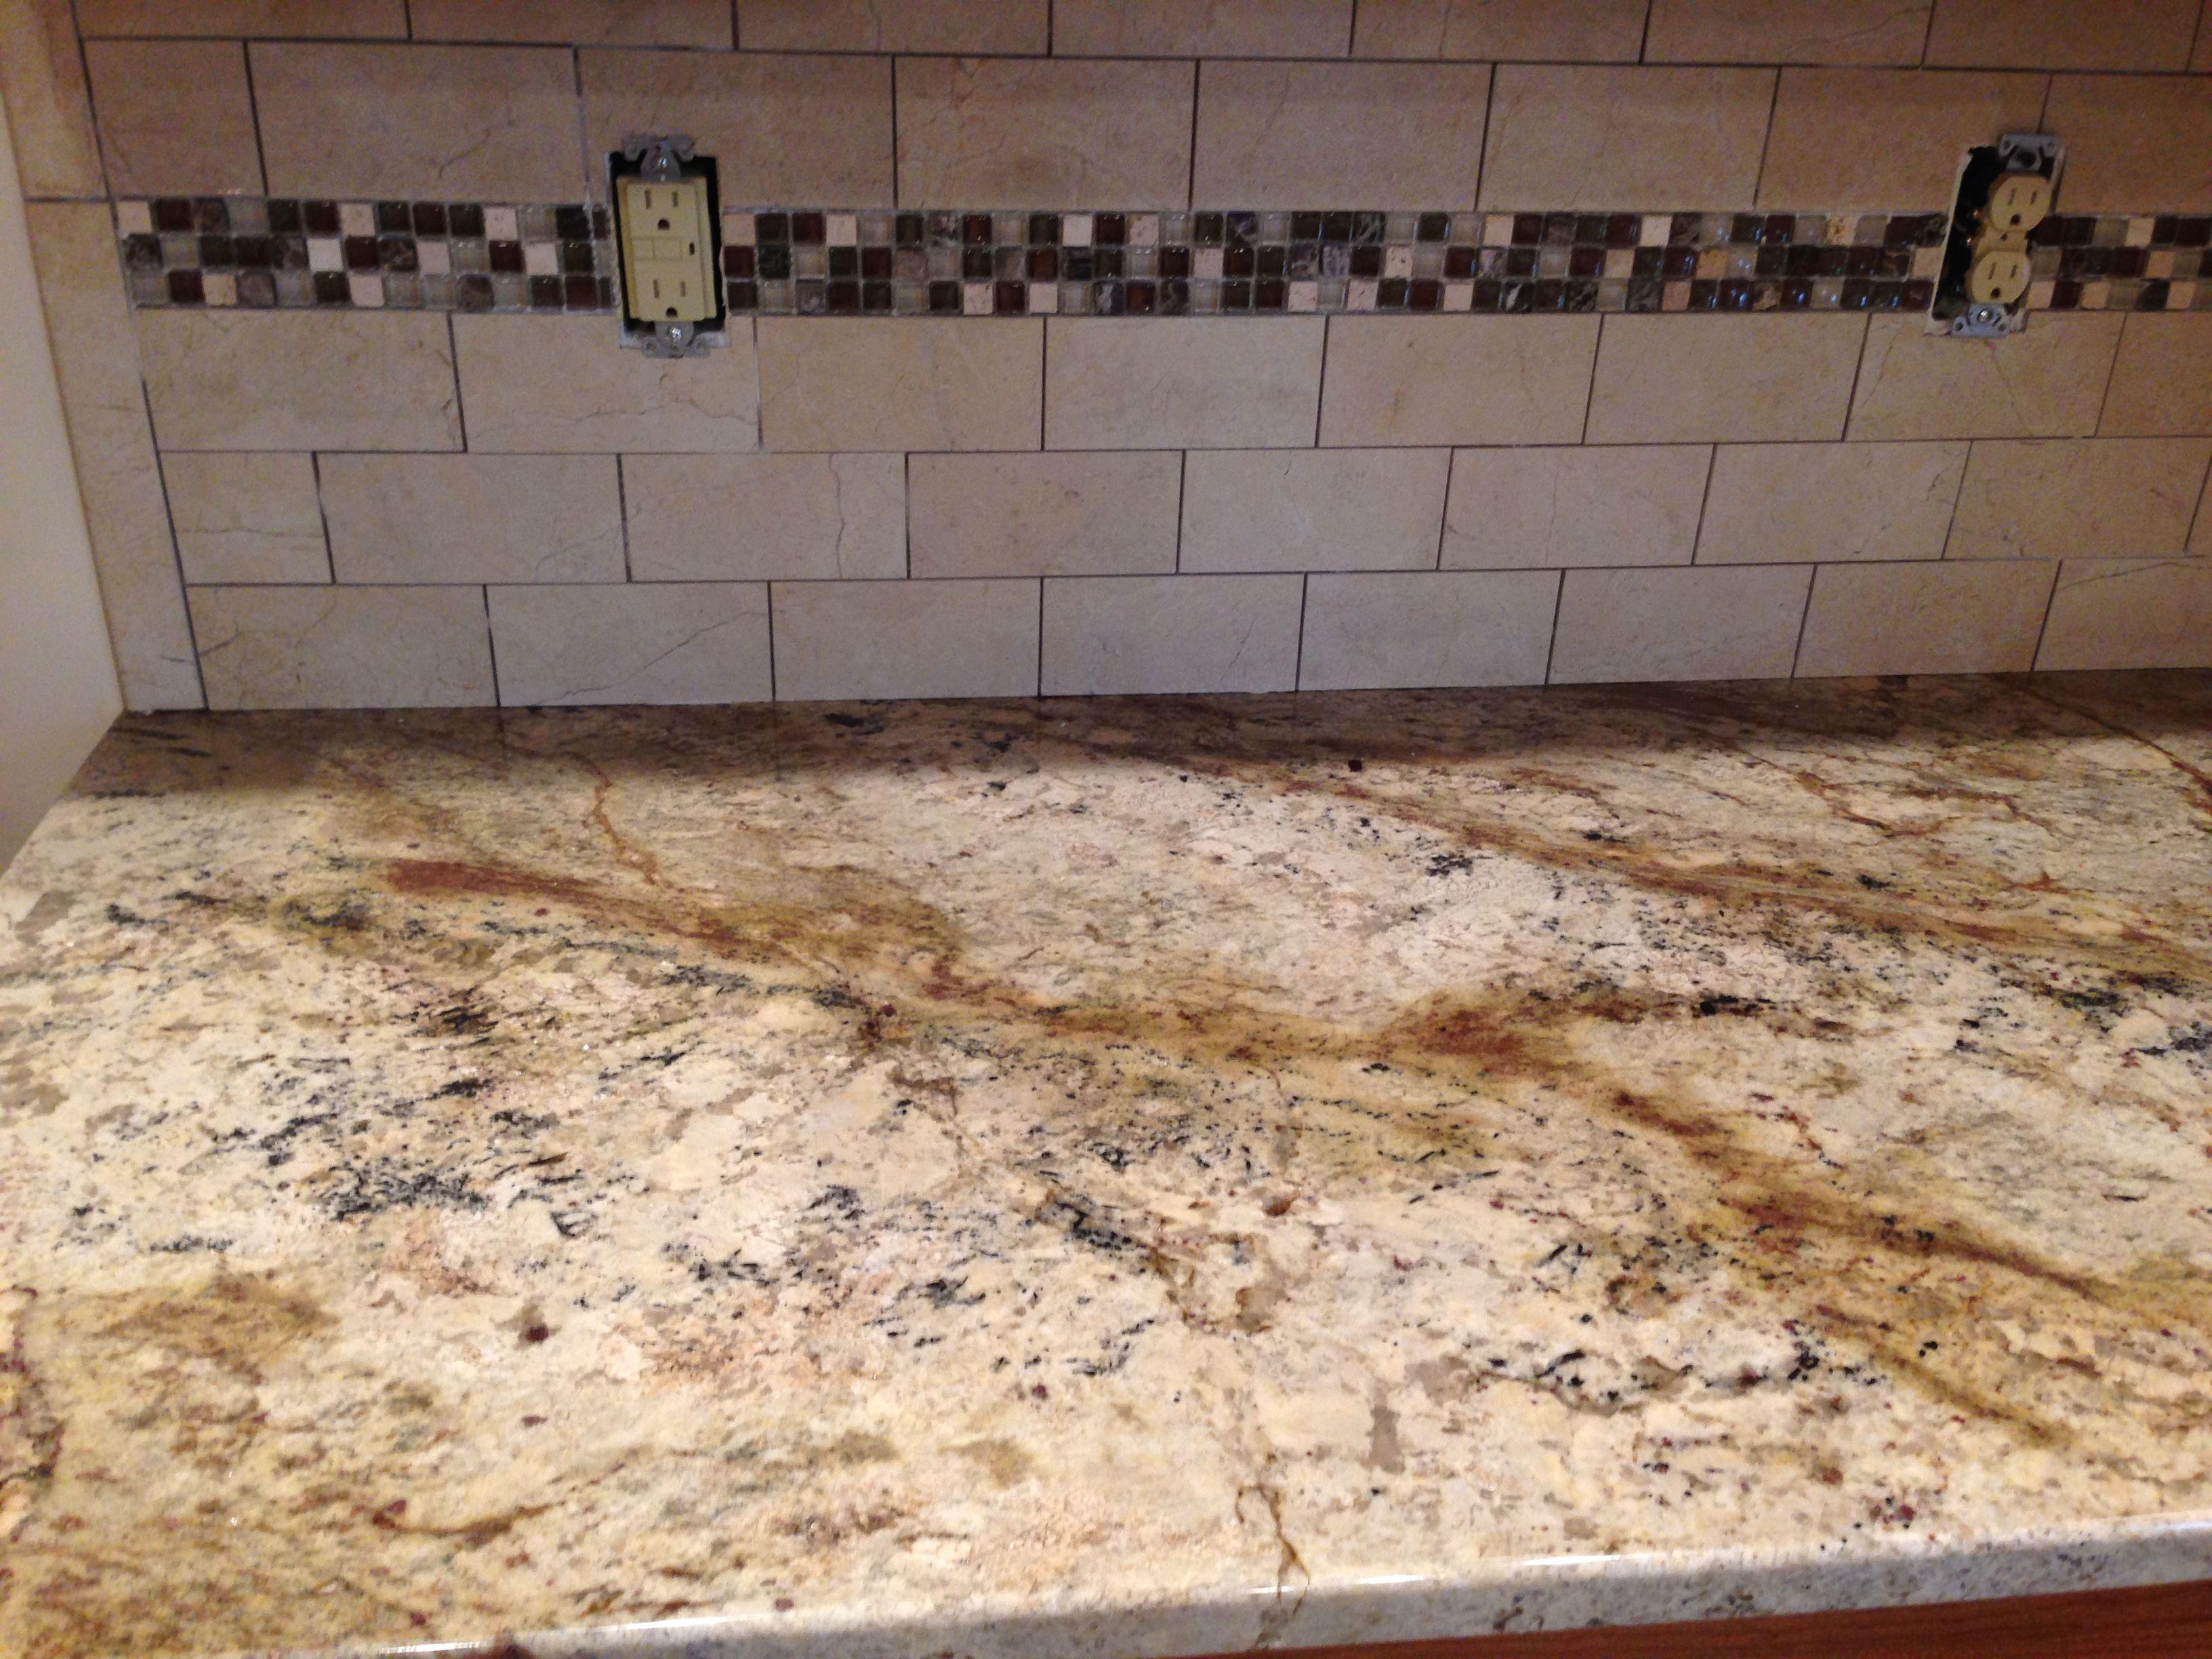 Typhoon Bordeaux Granite | Remolding kitchen, Kitchen ... on Typhoon Bordeaux Granite Backsplash Ideas  id=21438